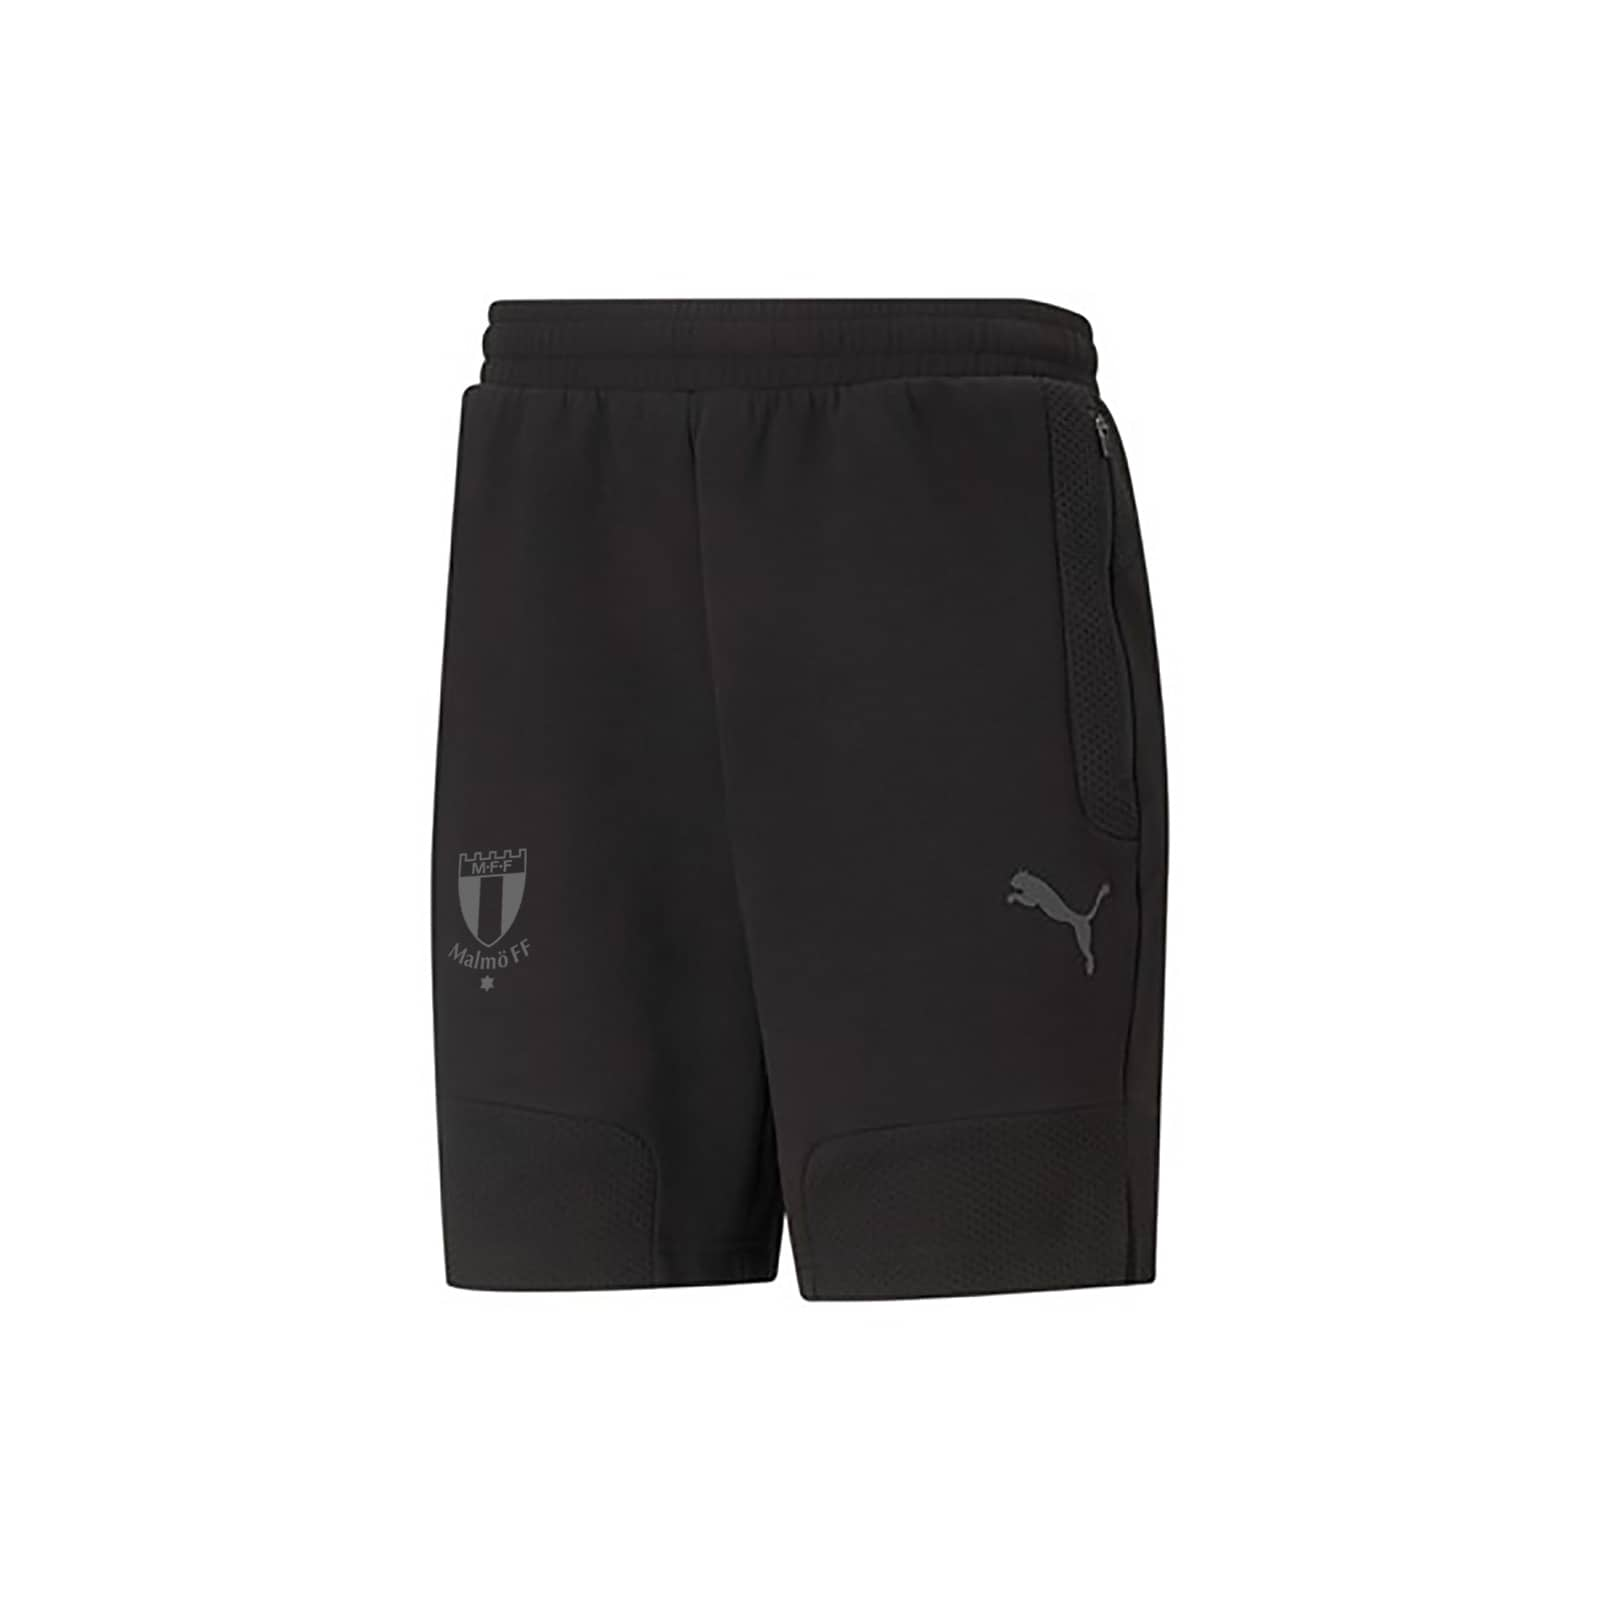 Puma teamcup shorts svart